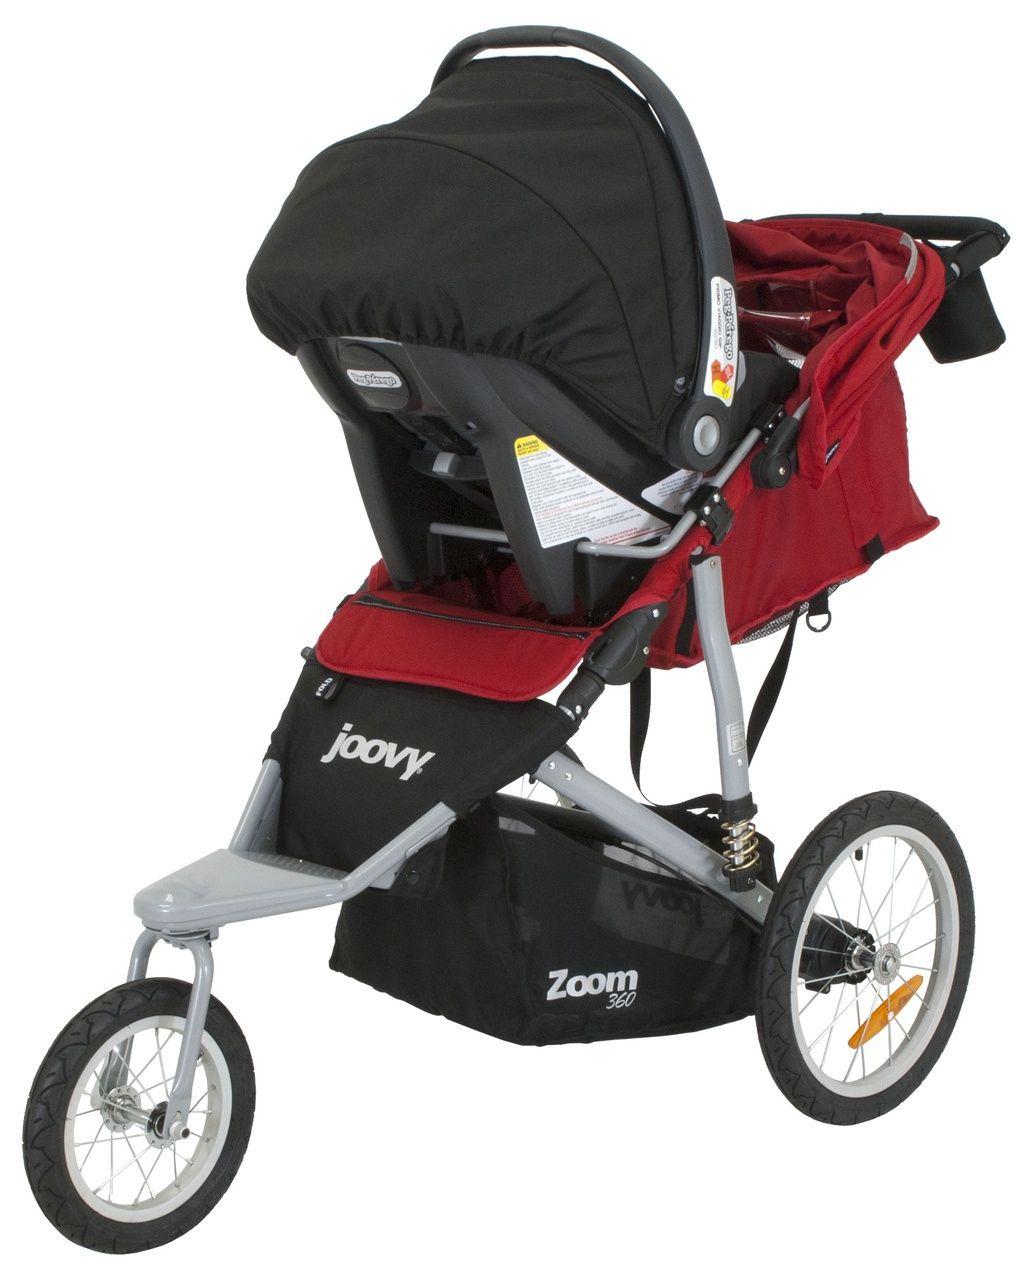 Zoom 360 Ultralight Jogging Stroller Car Seat Adapter